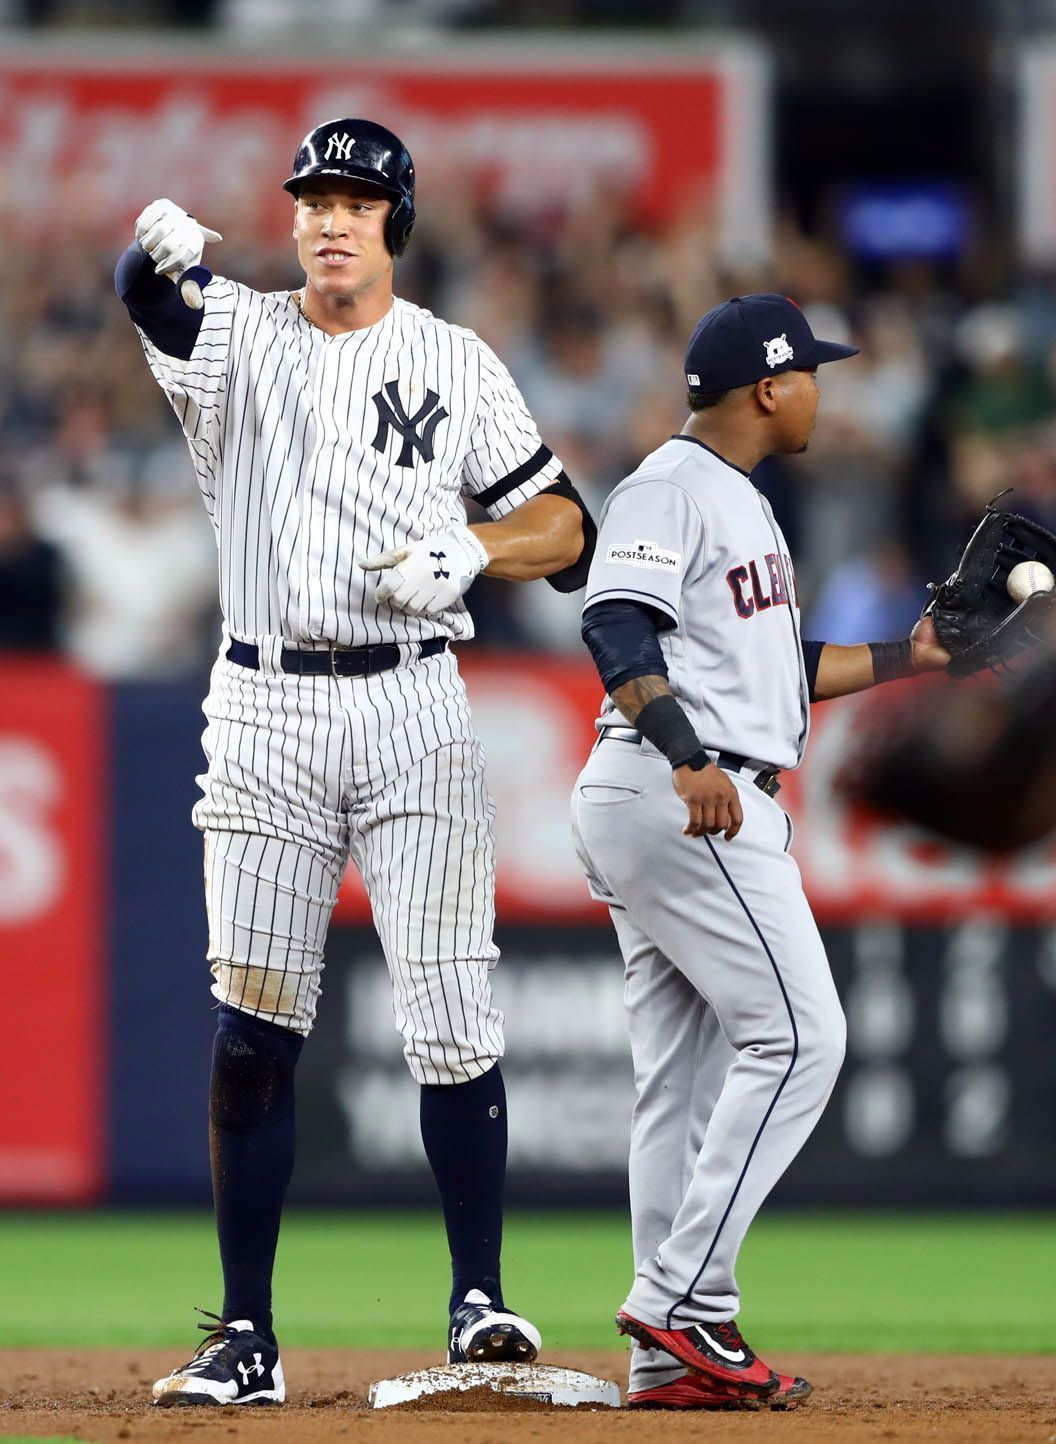 Pin by Yolanda Lopez on Sports in 2020 Yankees, New york